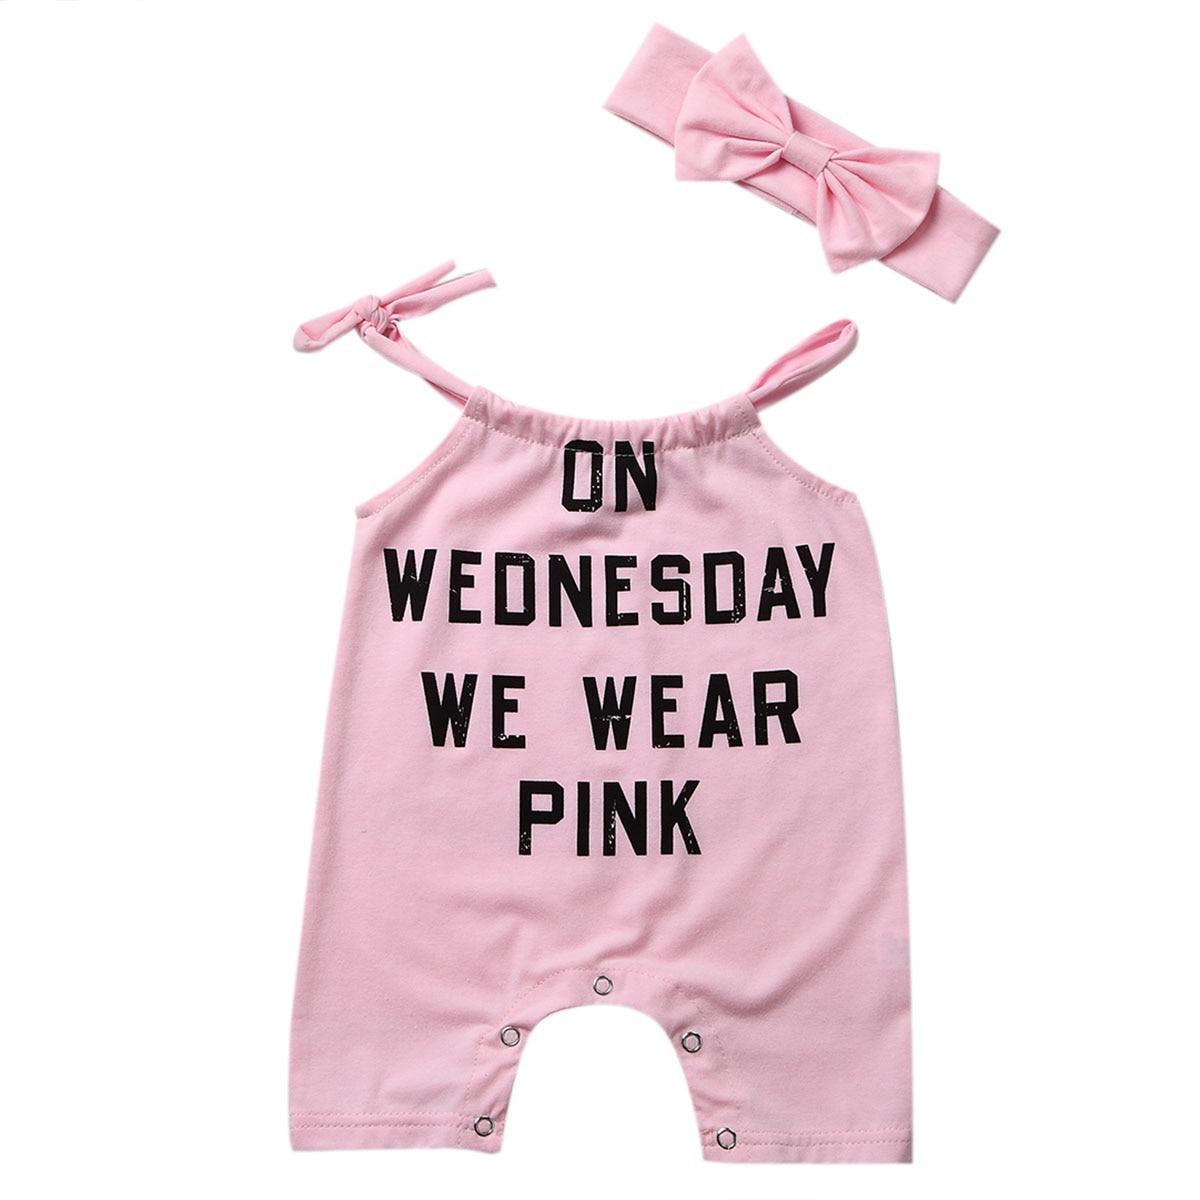 Baby Sleeveless Letter Romper Jumpsuit Sunsuit Outfit Set Playsuit Clothes Size 0-24M